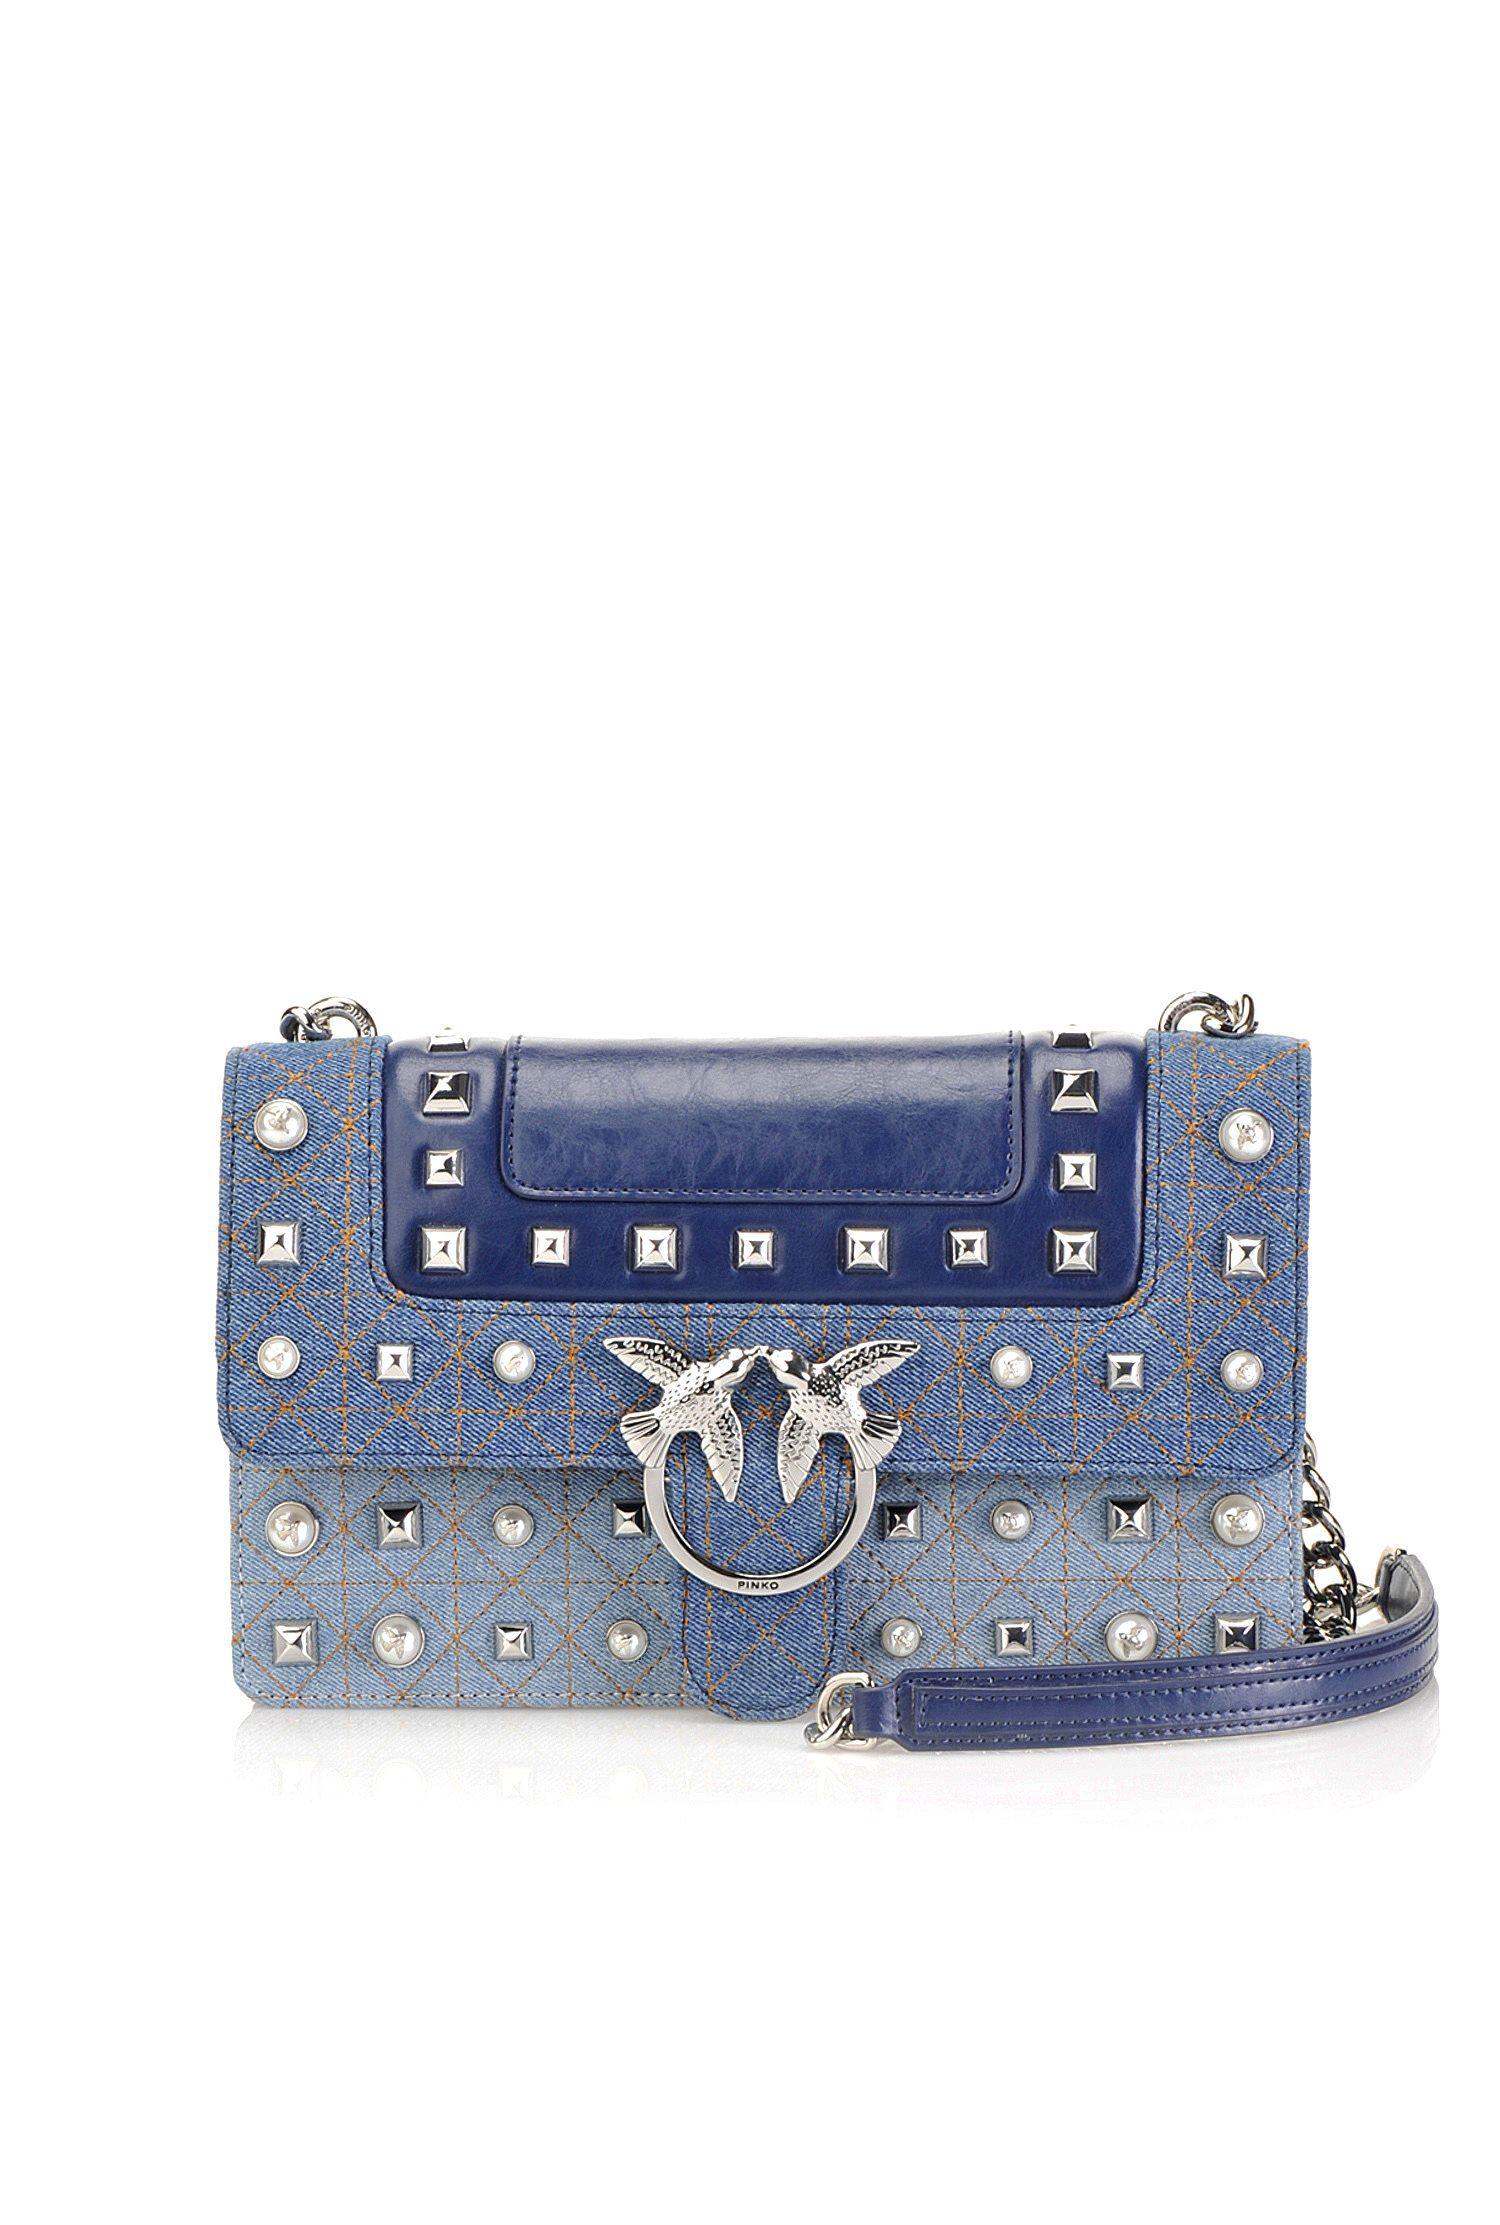 Jeans Pelle Bag E In Denim Love 7fqwaC5Bx